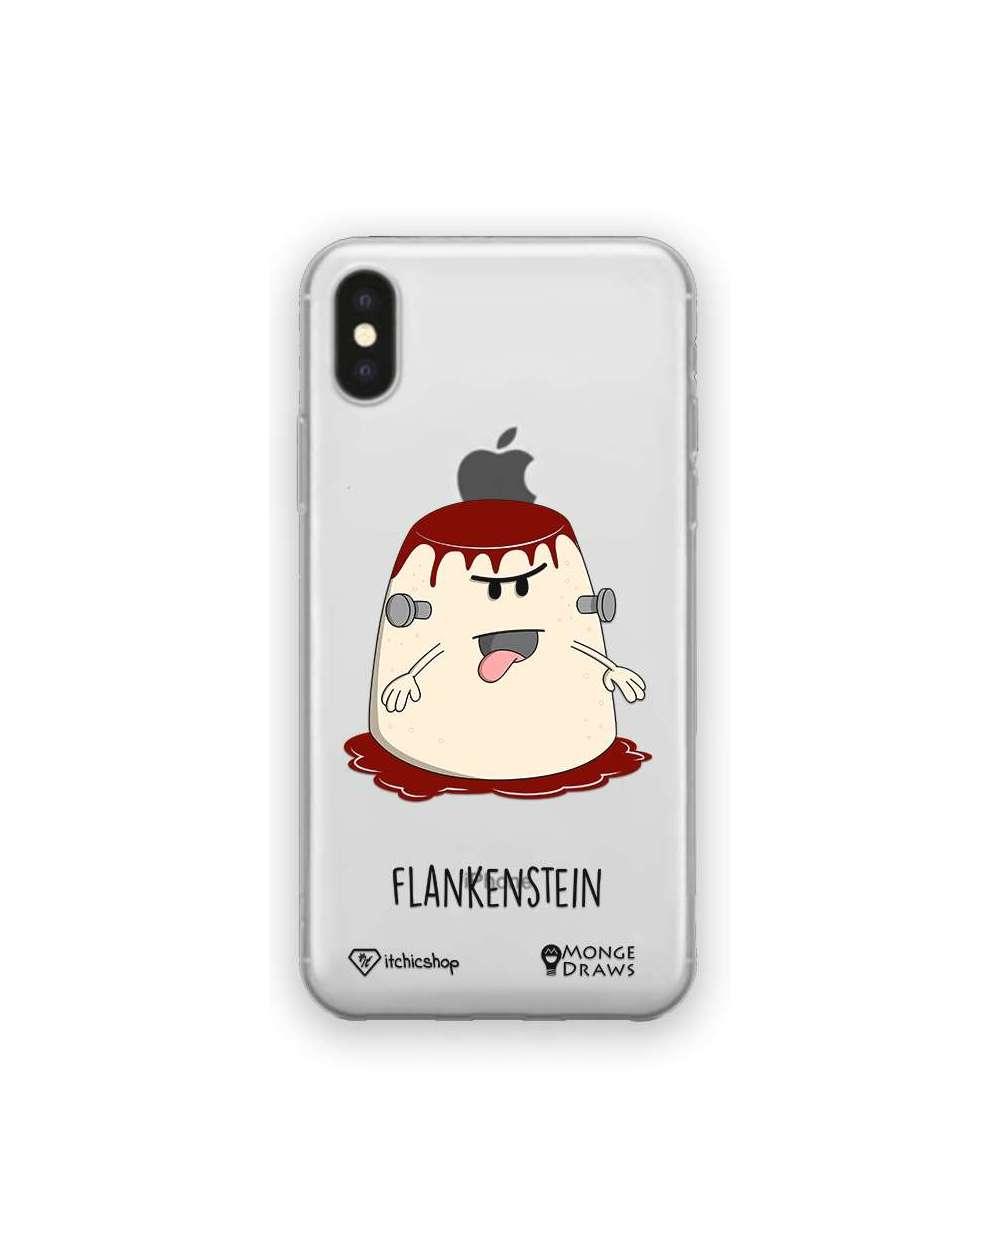 Flankestein